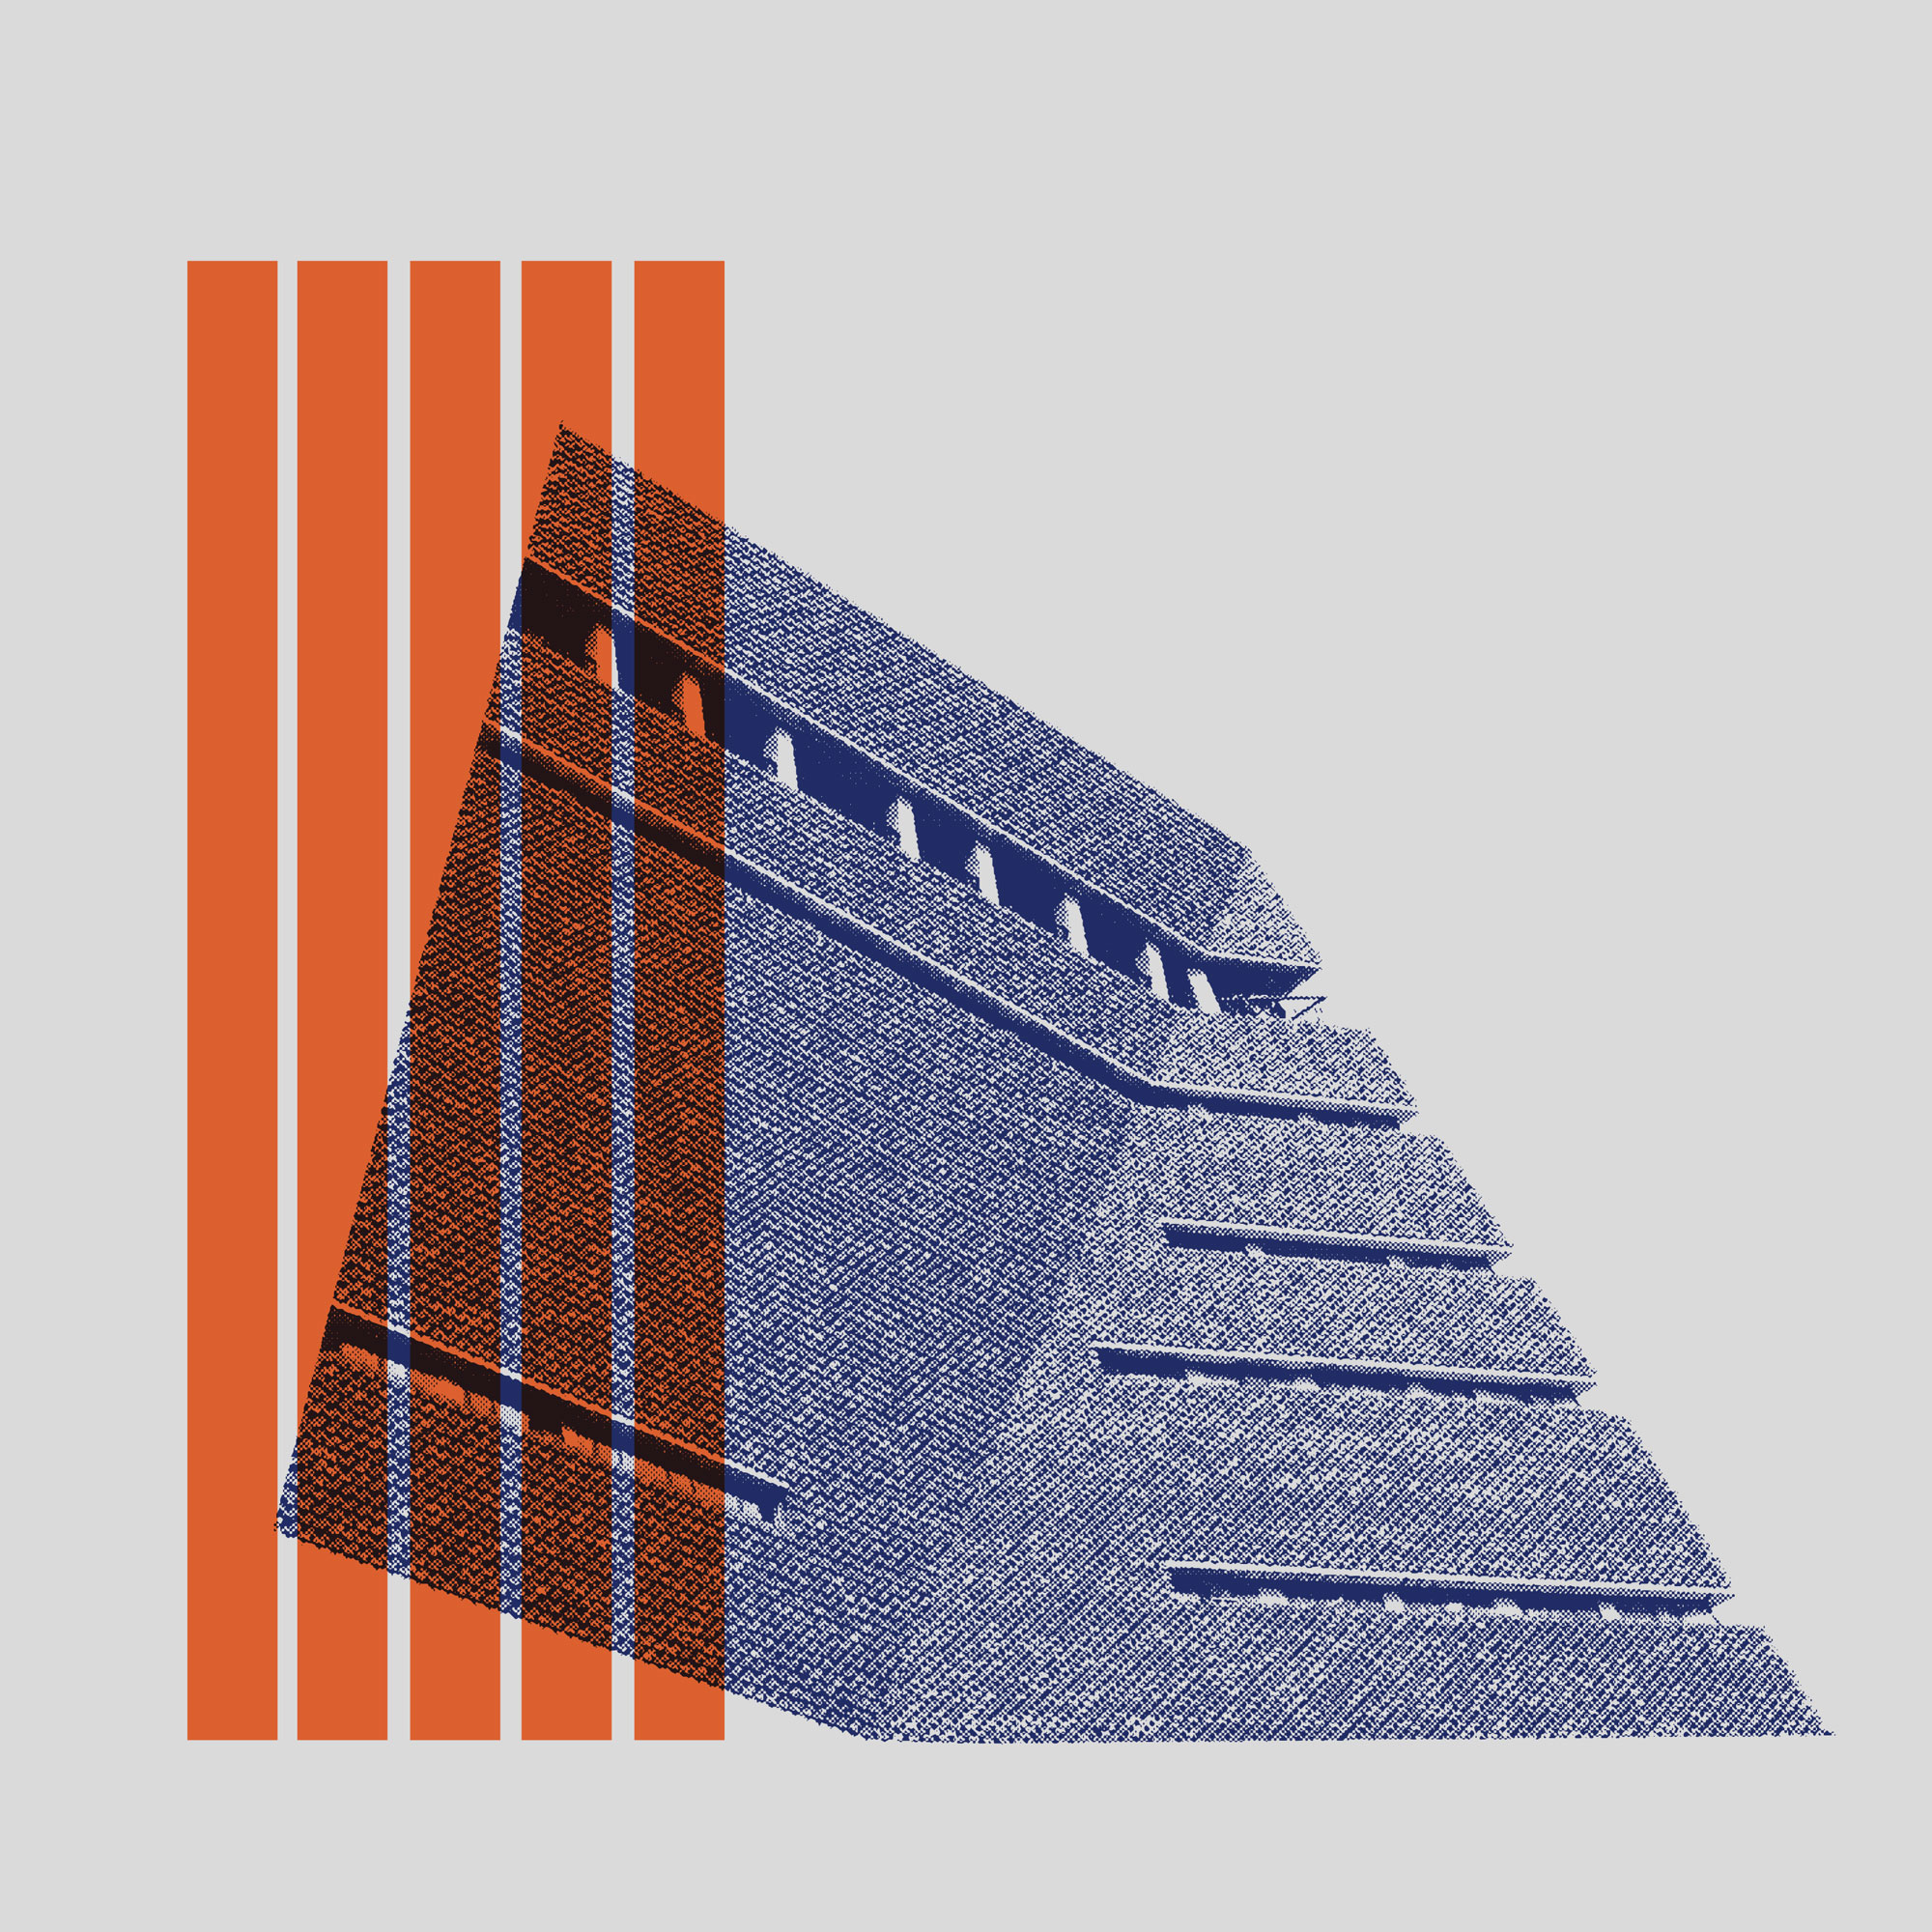 Tate T-shirt Design